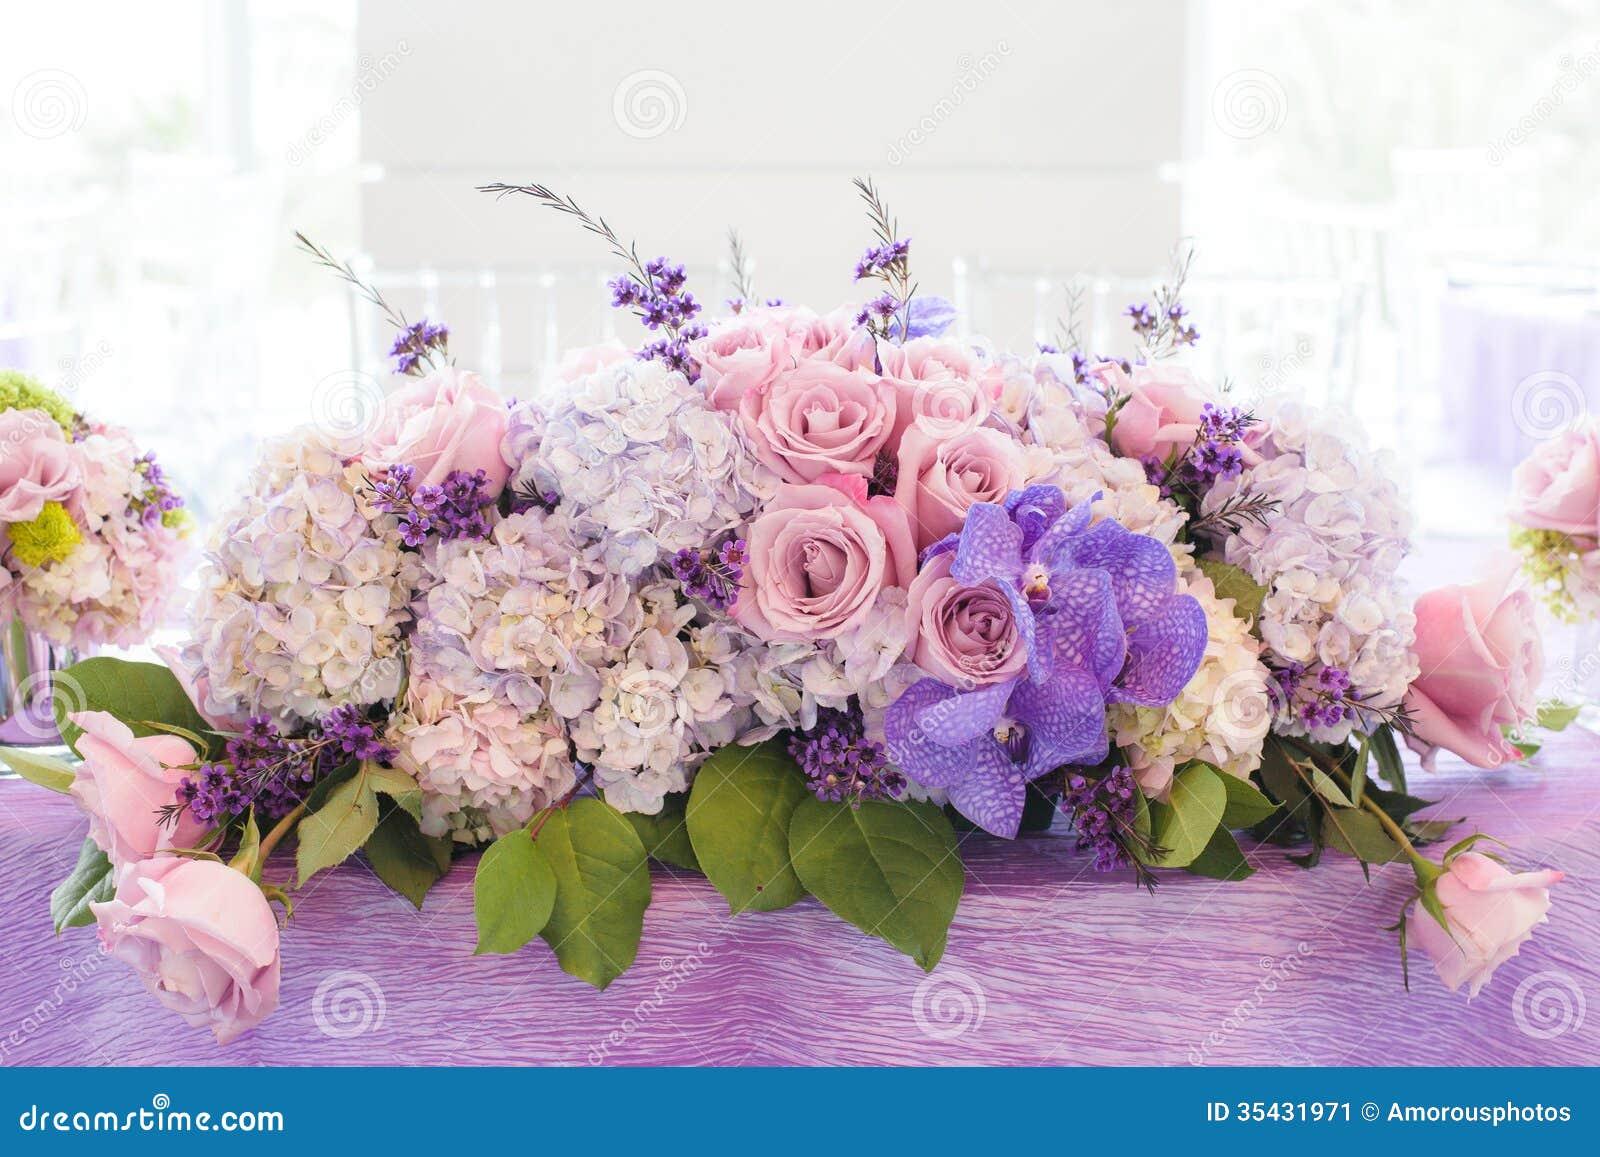 wedding bouquet on table stock image image of details 35431971. Black Bedroom Furniture Sets. Home Design Ideas